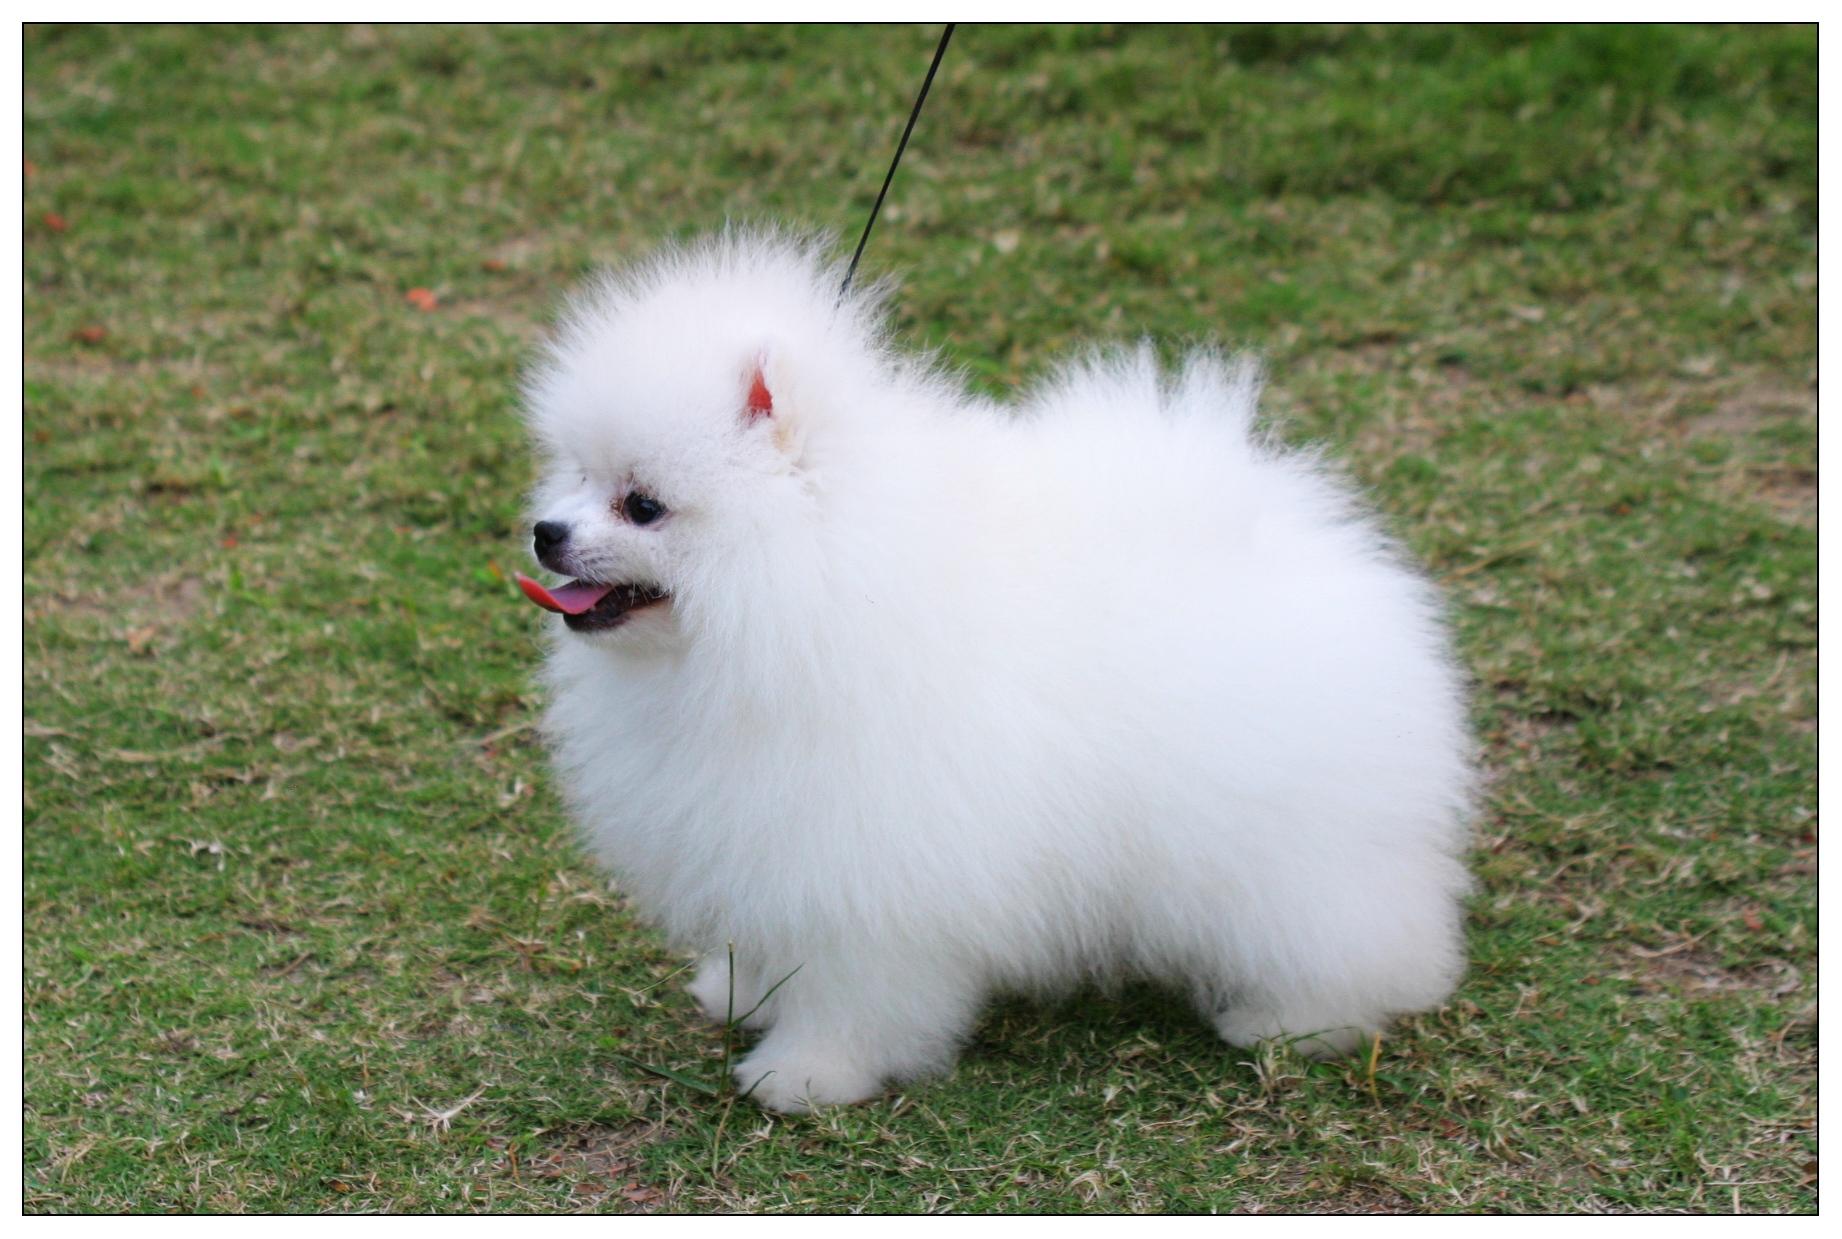 White Teacup Pomeranian Dog Animalcarecollege Info